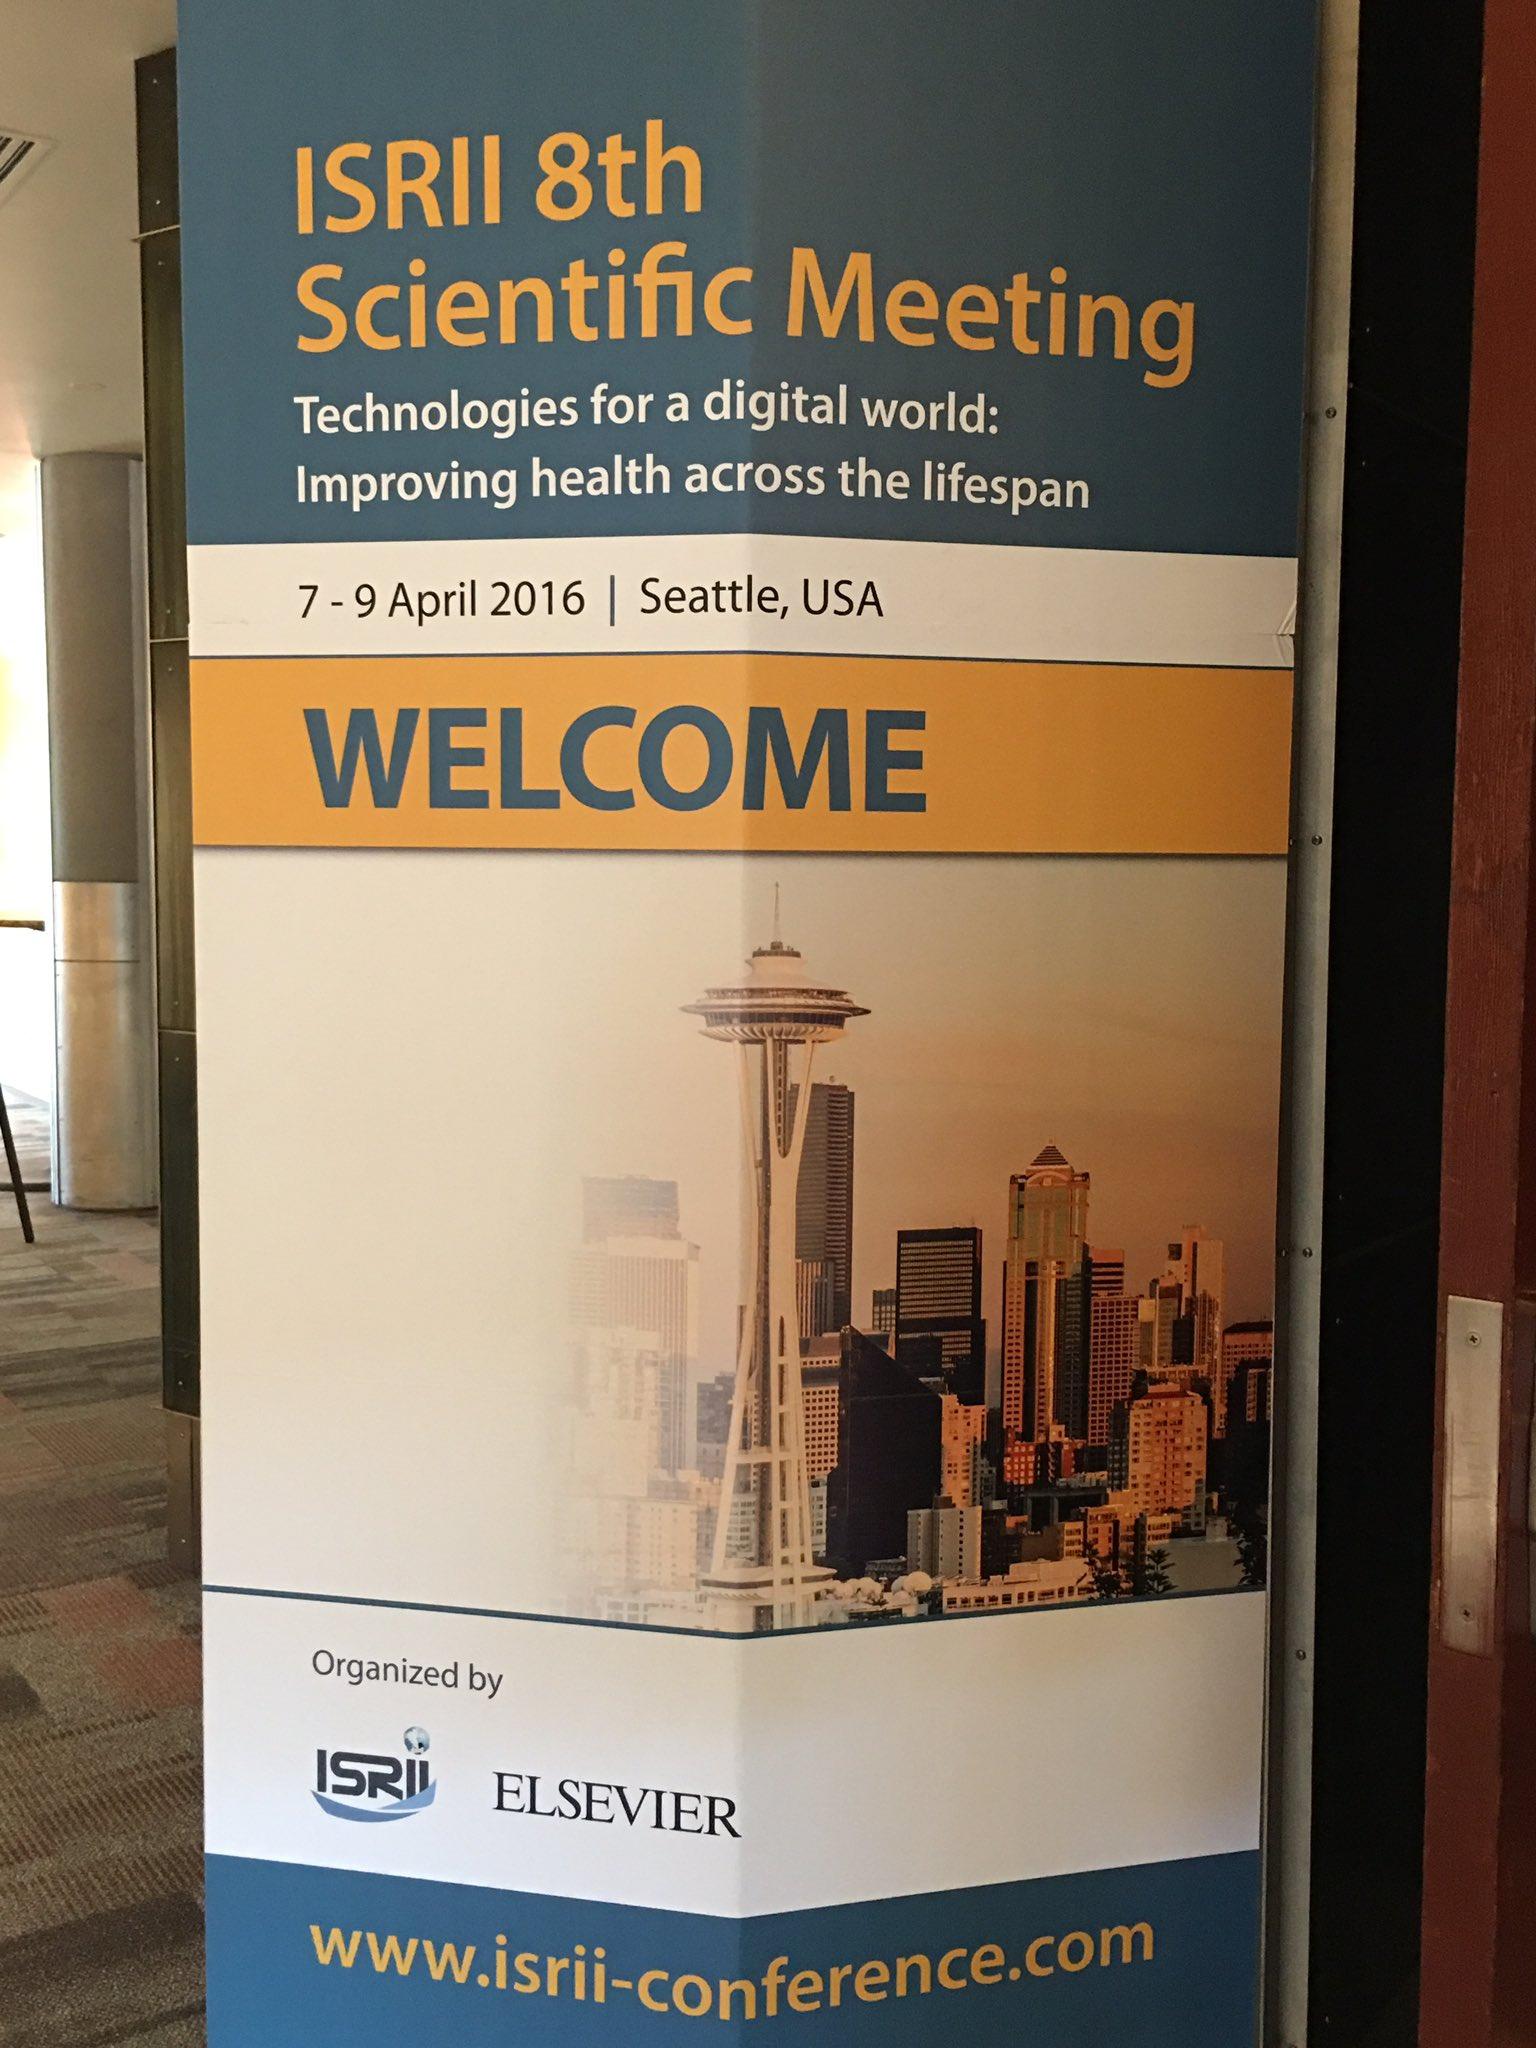 ISRII 8th Scientific Meeting. Health across the lifespan. #isrii8 #pflegetab https://t.co/0KJeYHTseF